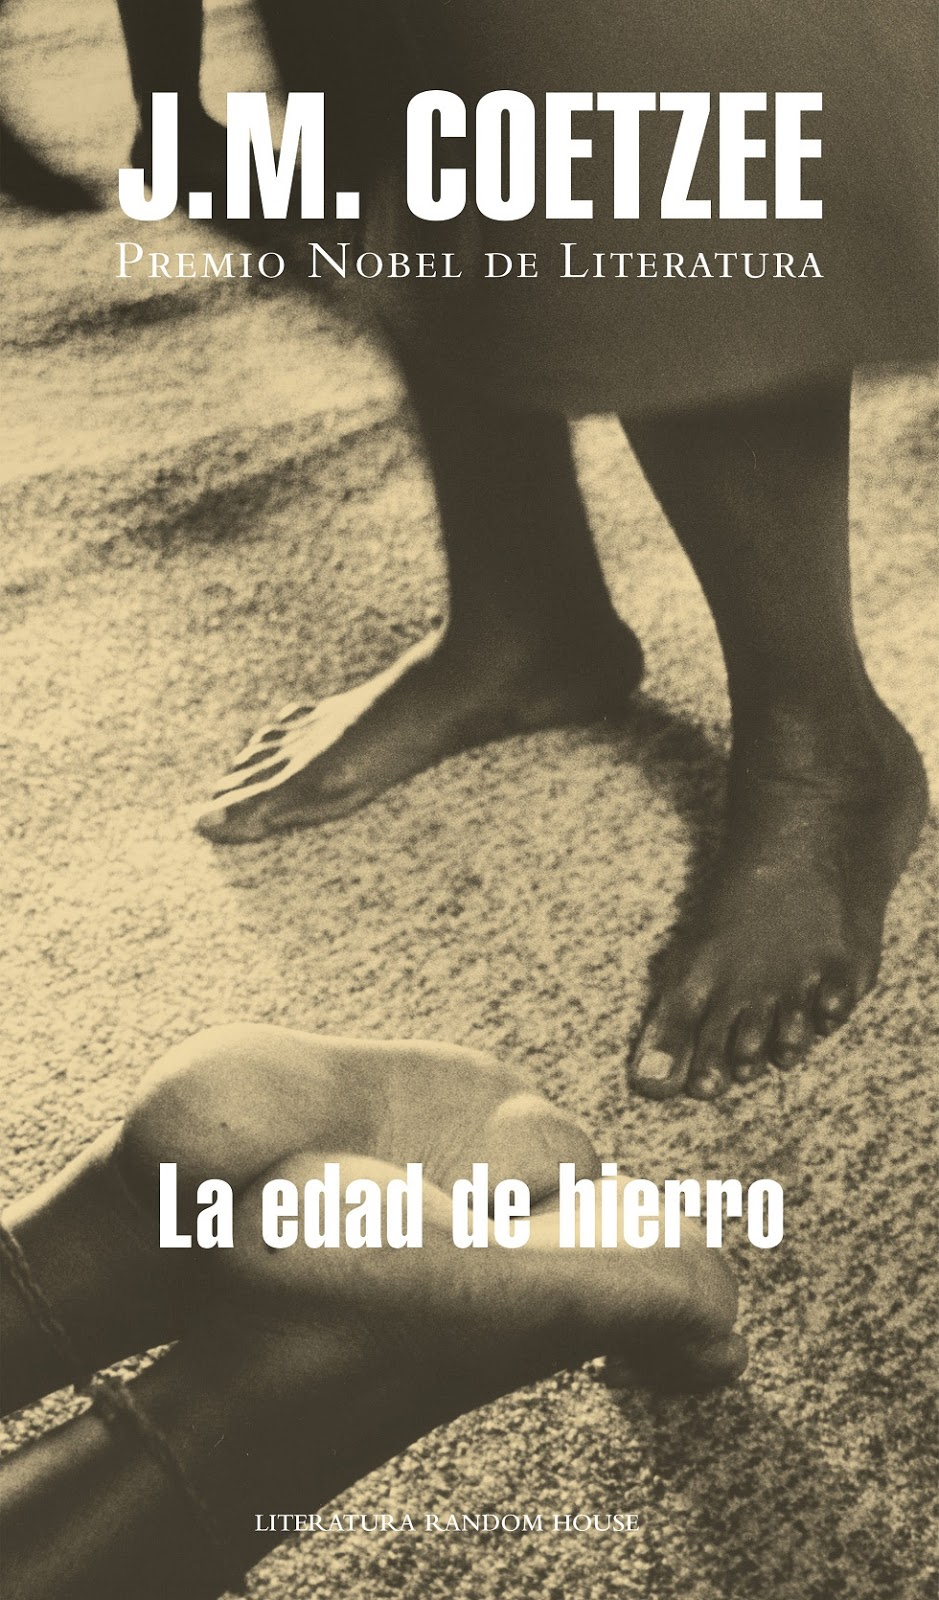 http://laantiguabiblos.blogspot.com/2018/04/la-edad-de-hierro-j-m-coetzee.html